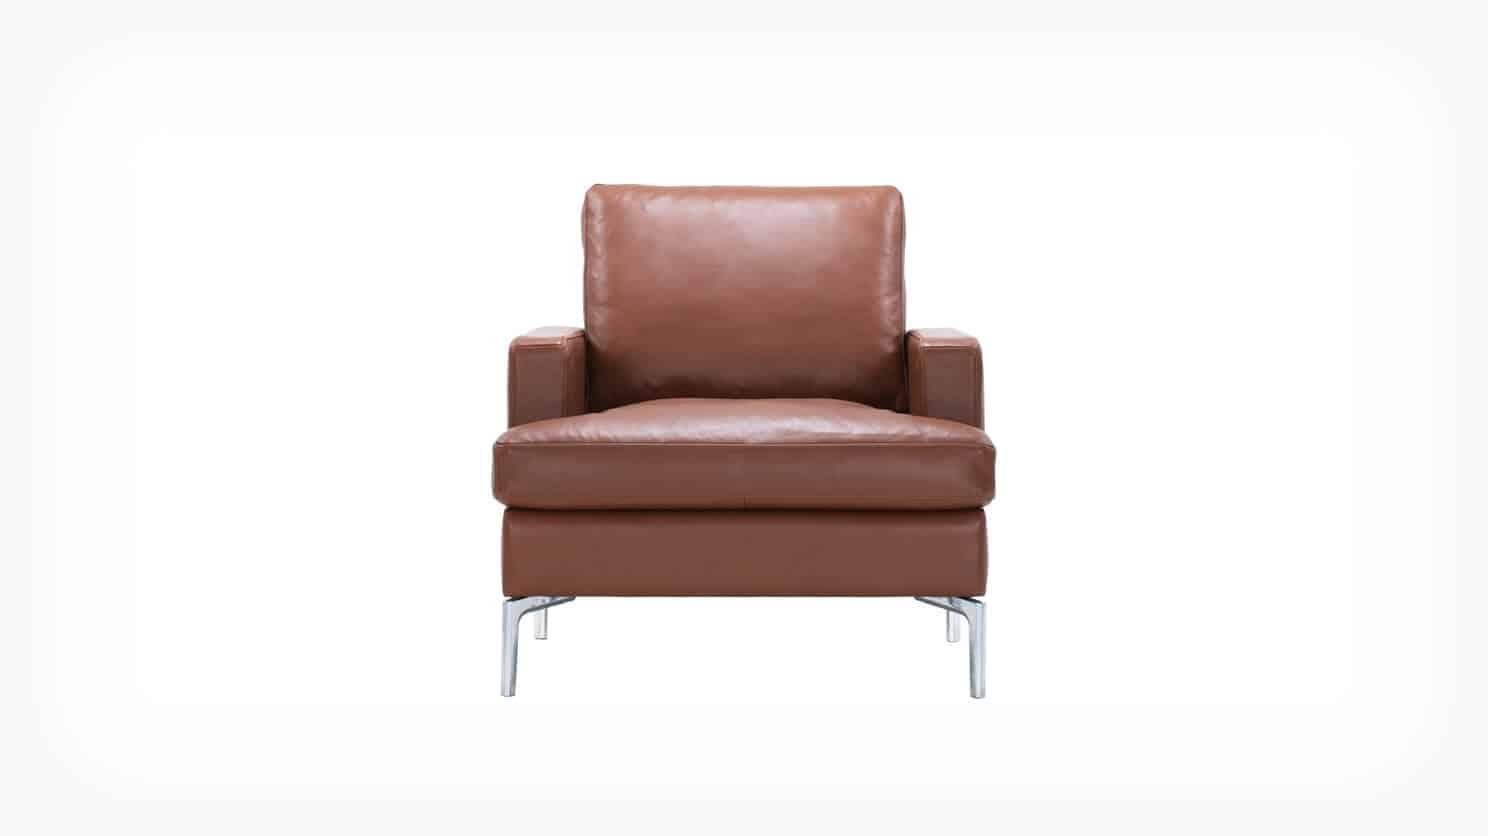 37127 02 1 chairs eve chair durango rio front